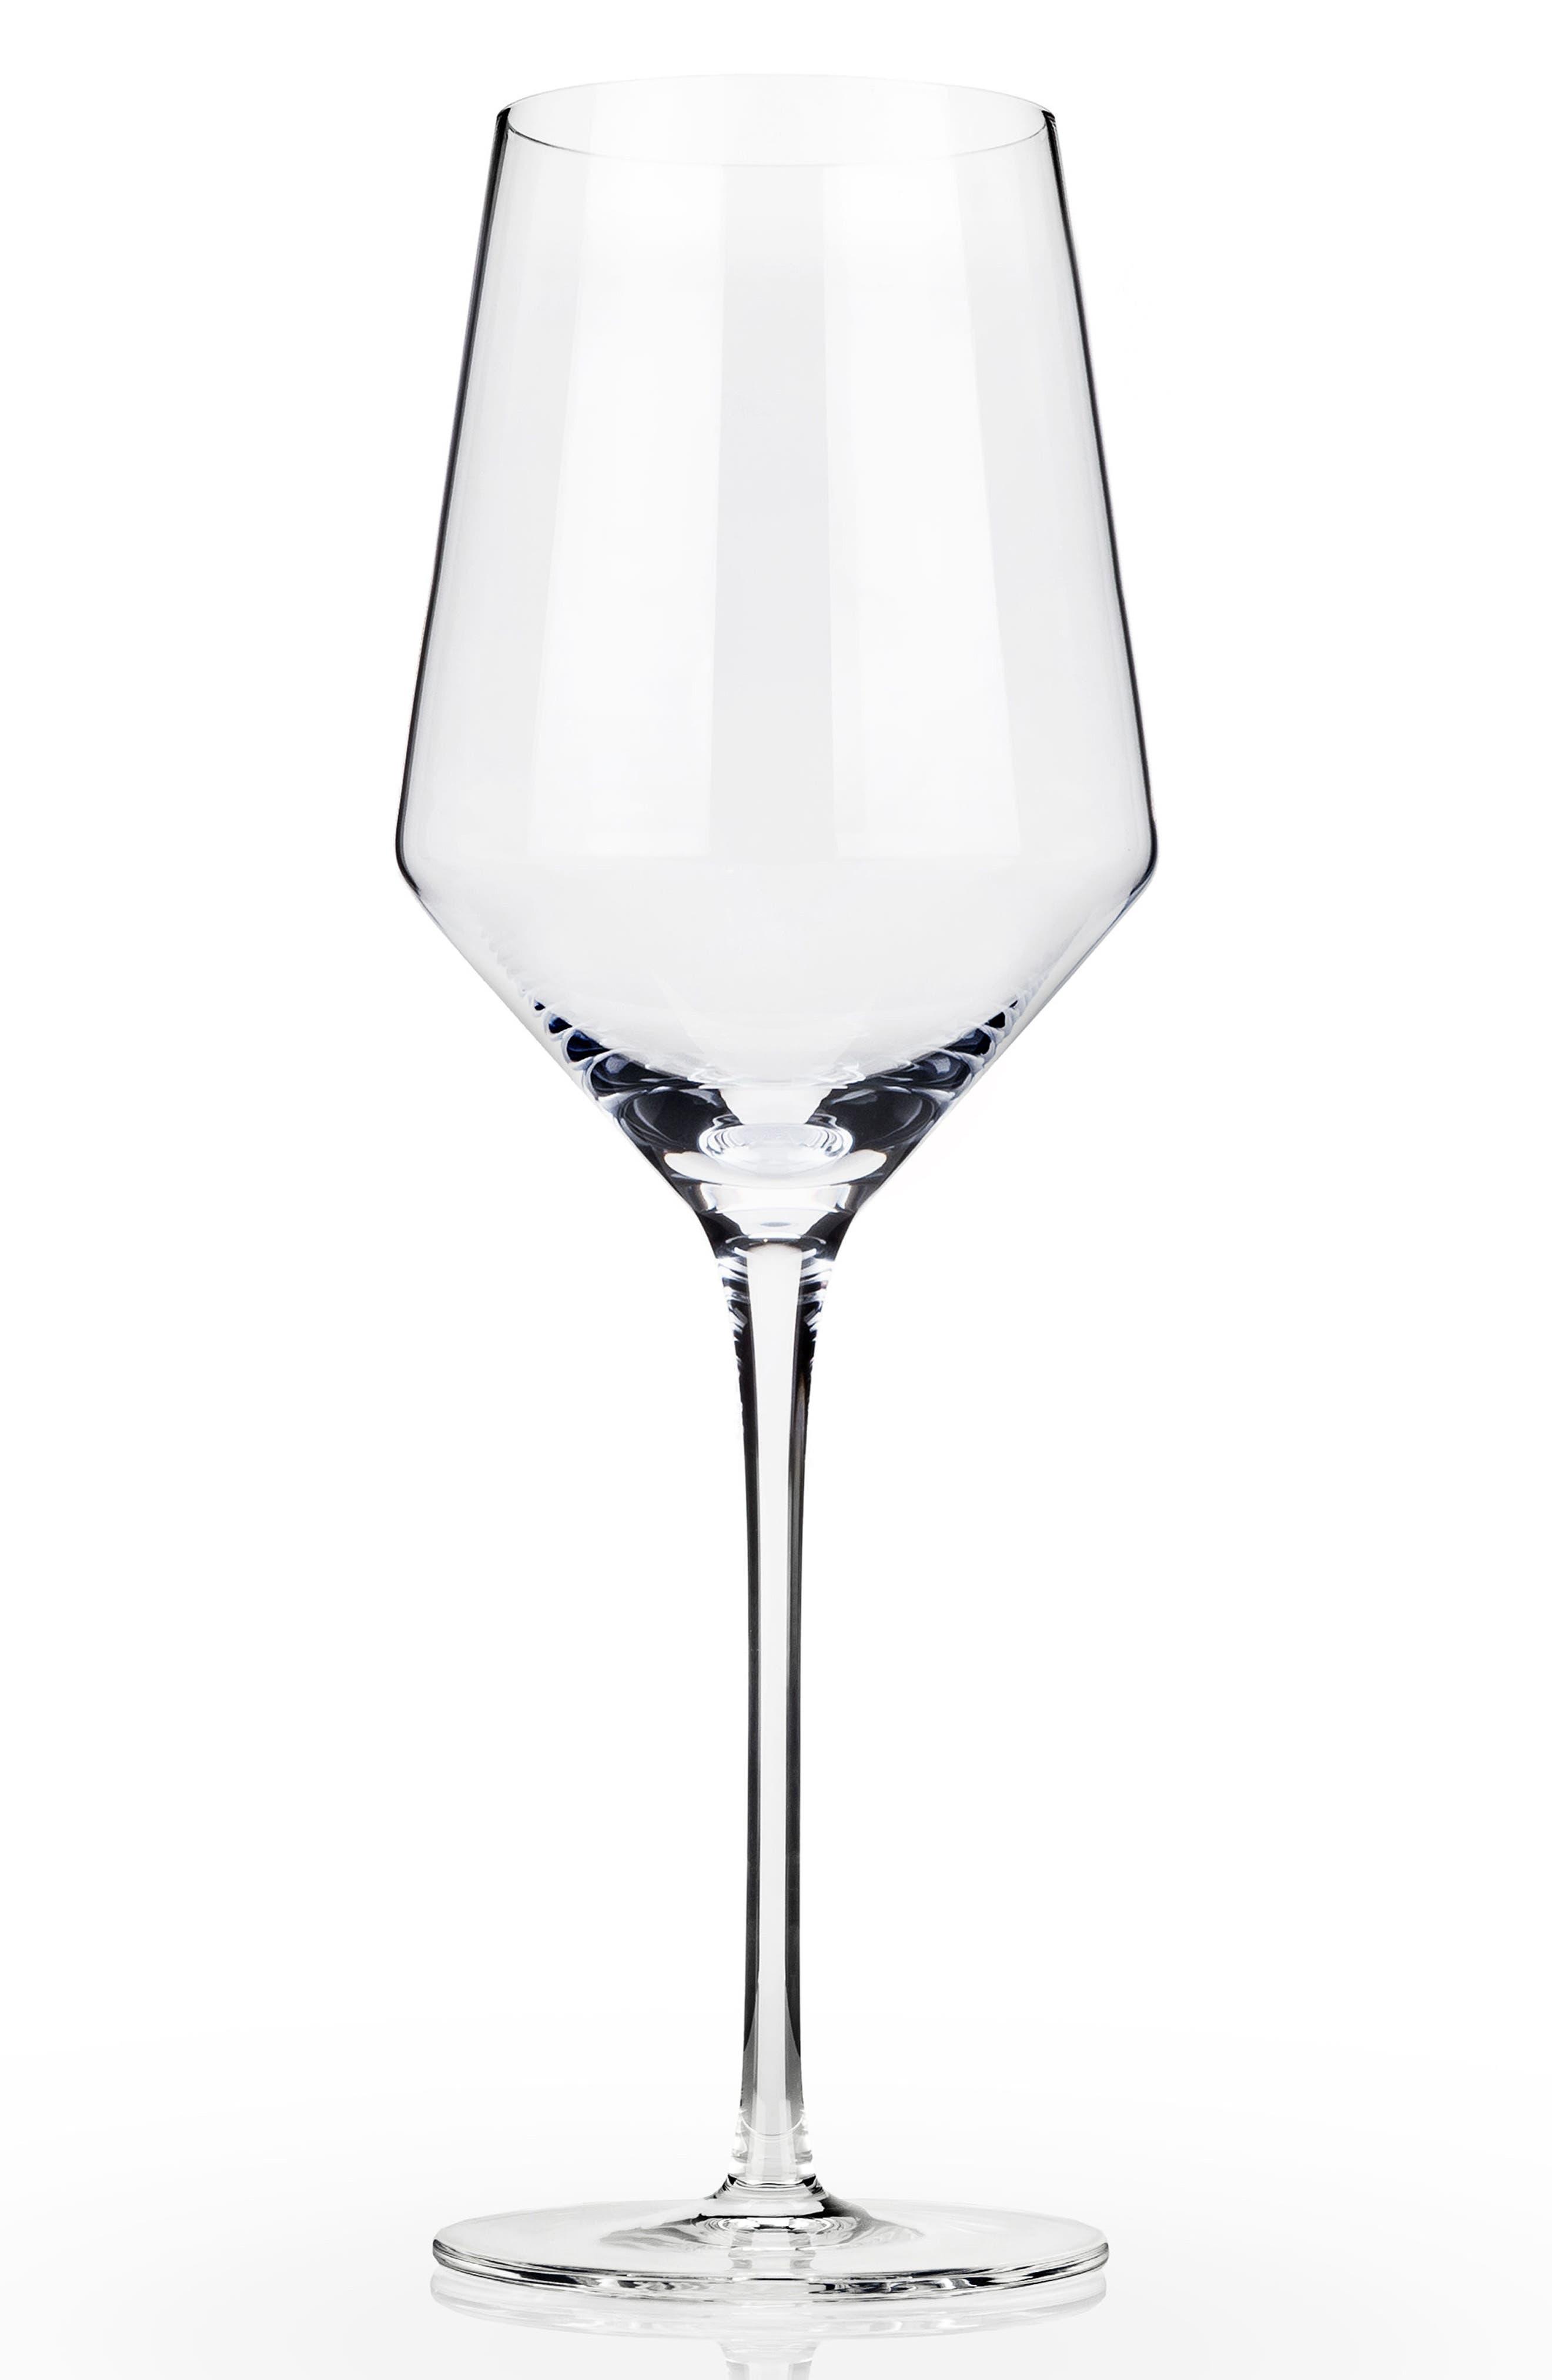 Raye Set of 2 Chardonnay Glasses,                             Main thumbnail 1, color,                             CLEAR